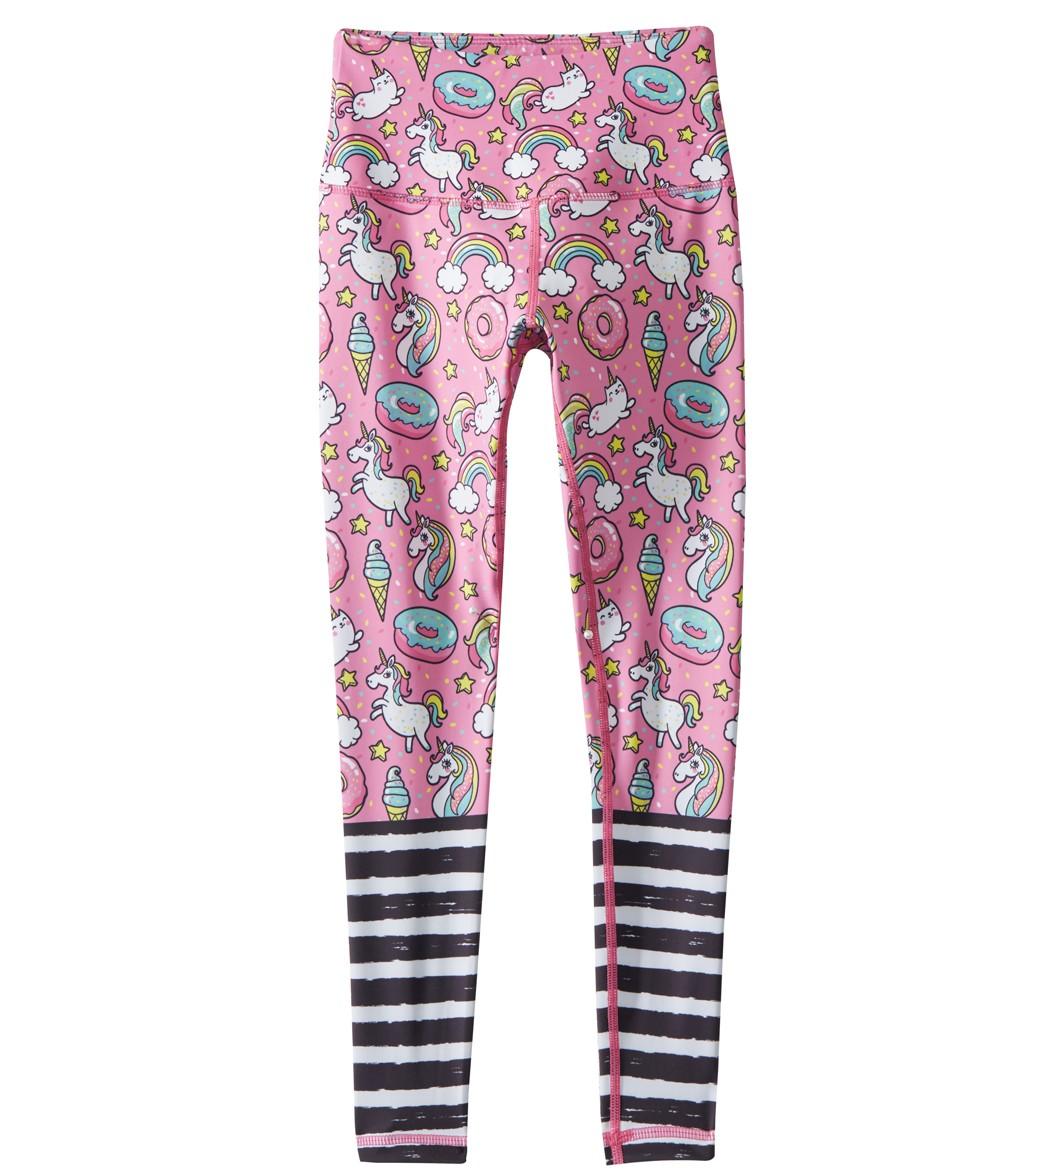 b180c9f7025f0 Flexi Lexi Girls  Pink Unicorn and Rainbow Flexi Leggings at SwimOutlet.com  - Free Shipping